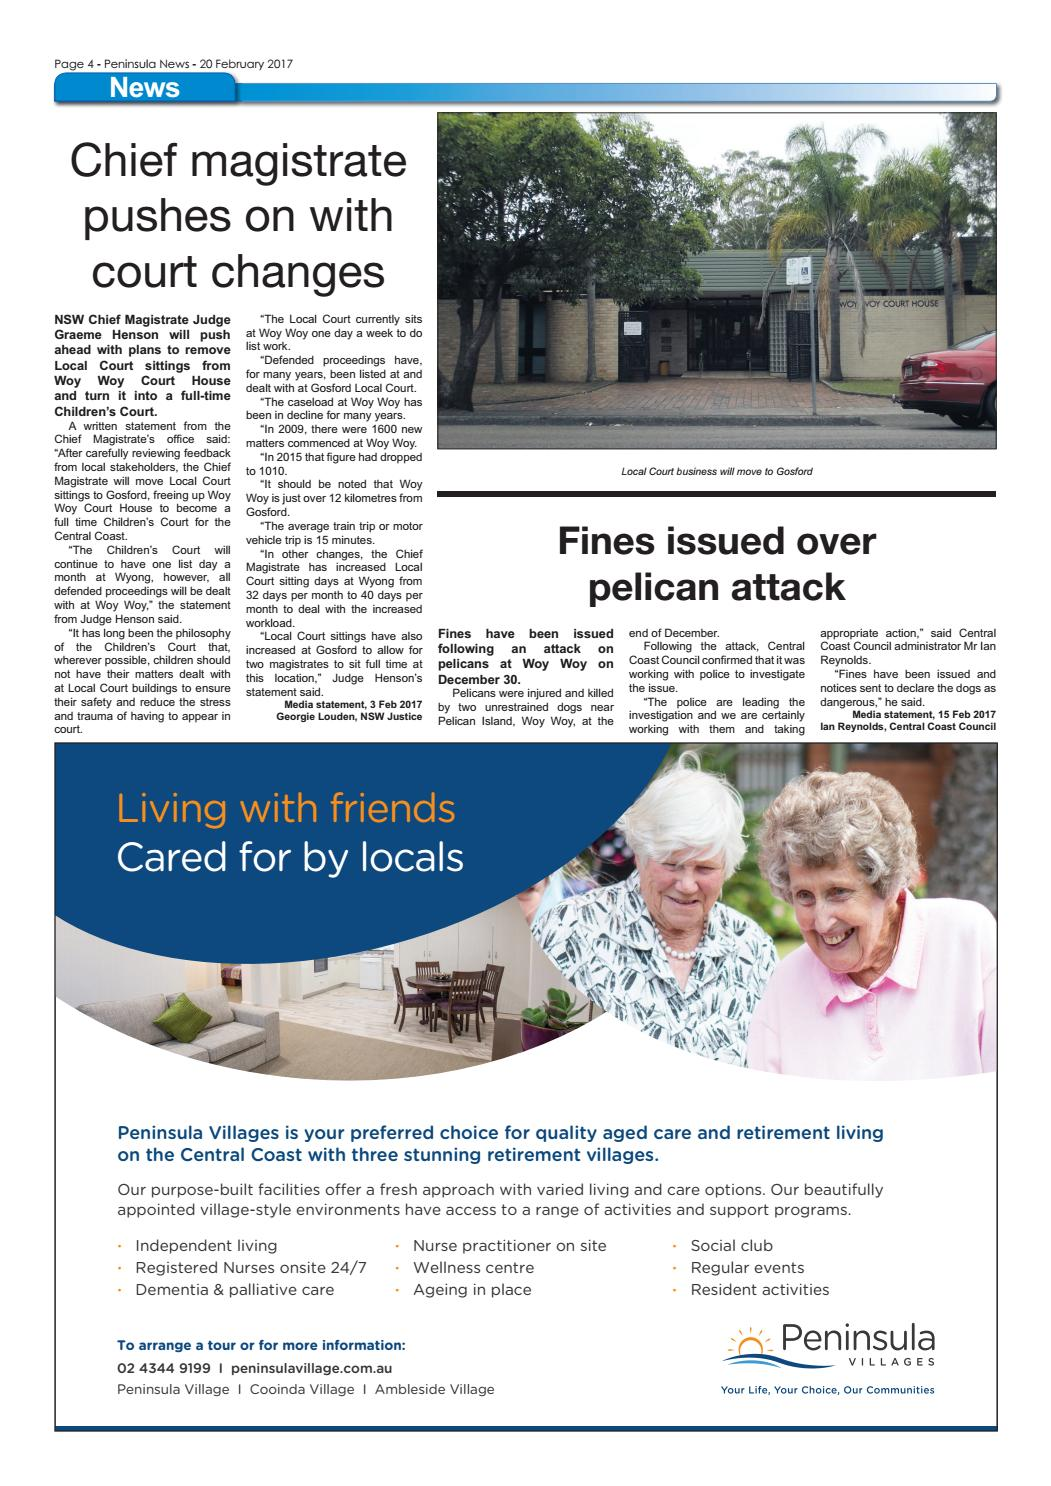 Peninsula News 413 by Mark Snell - issuu